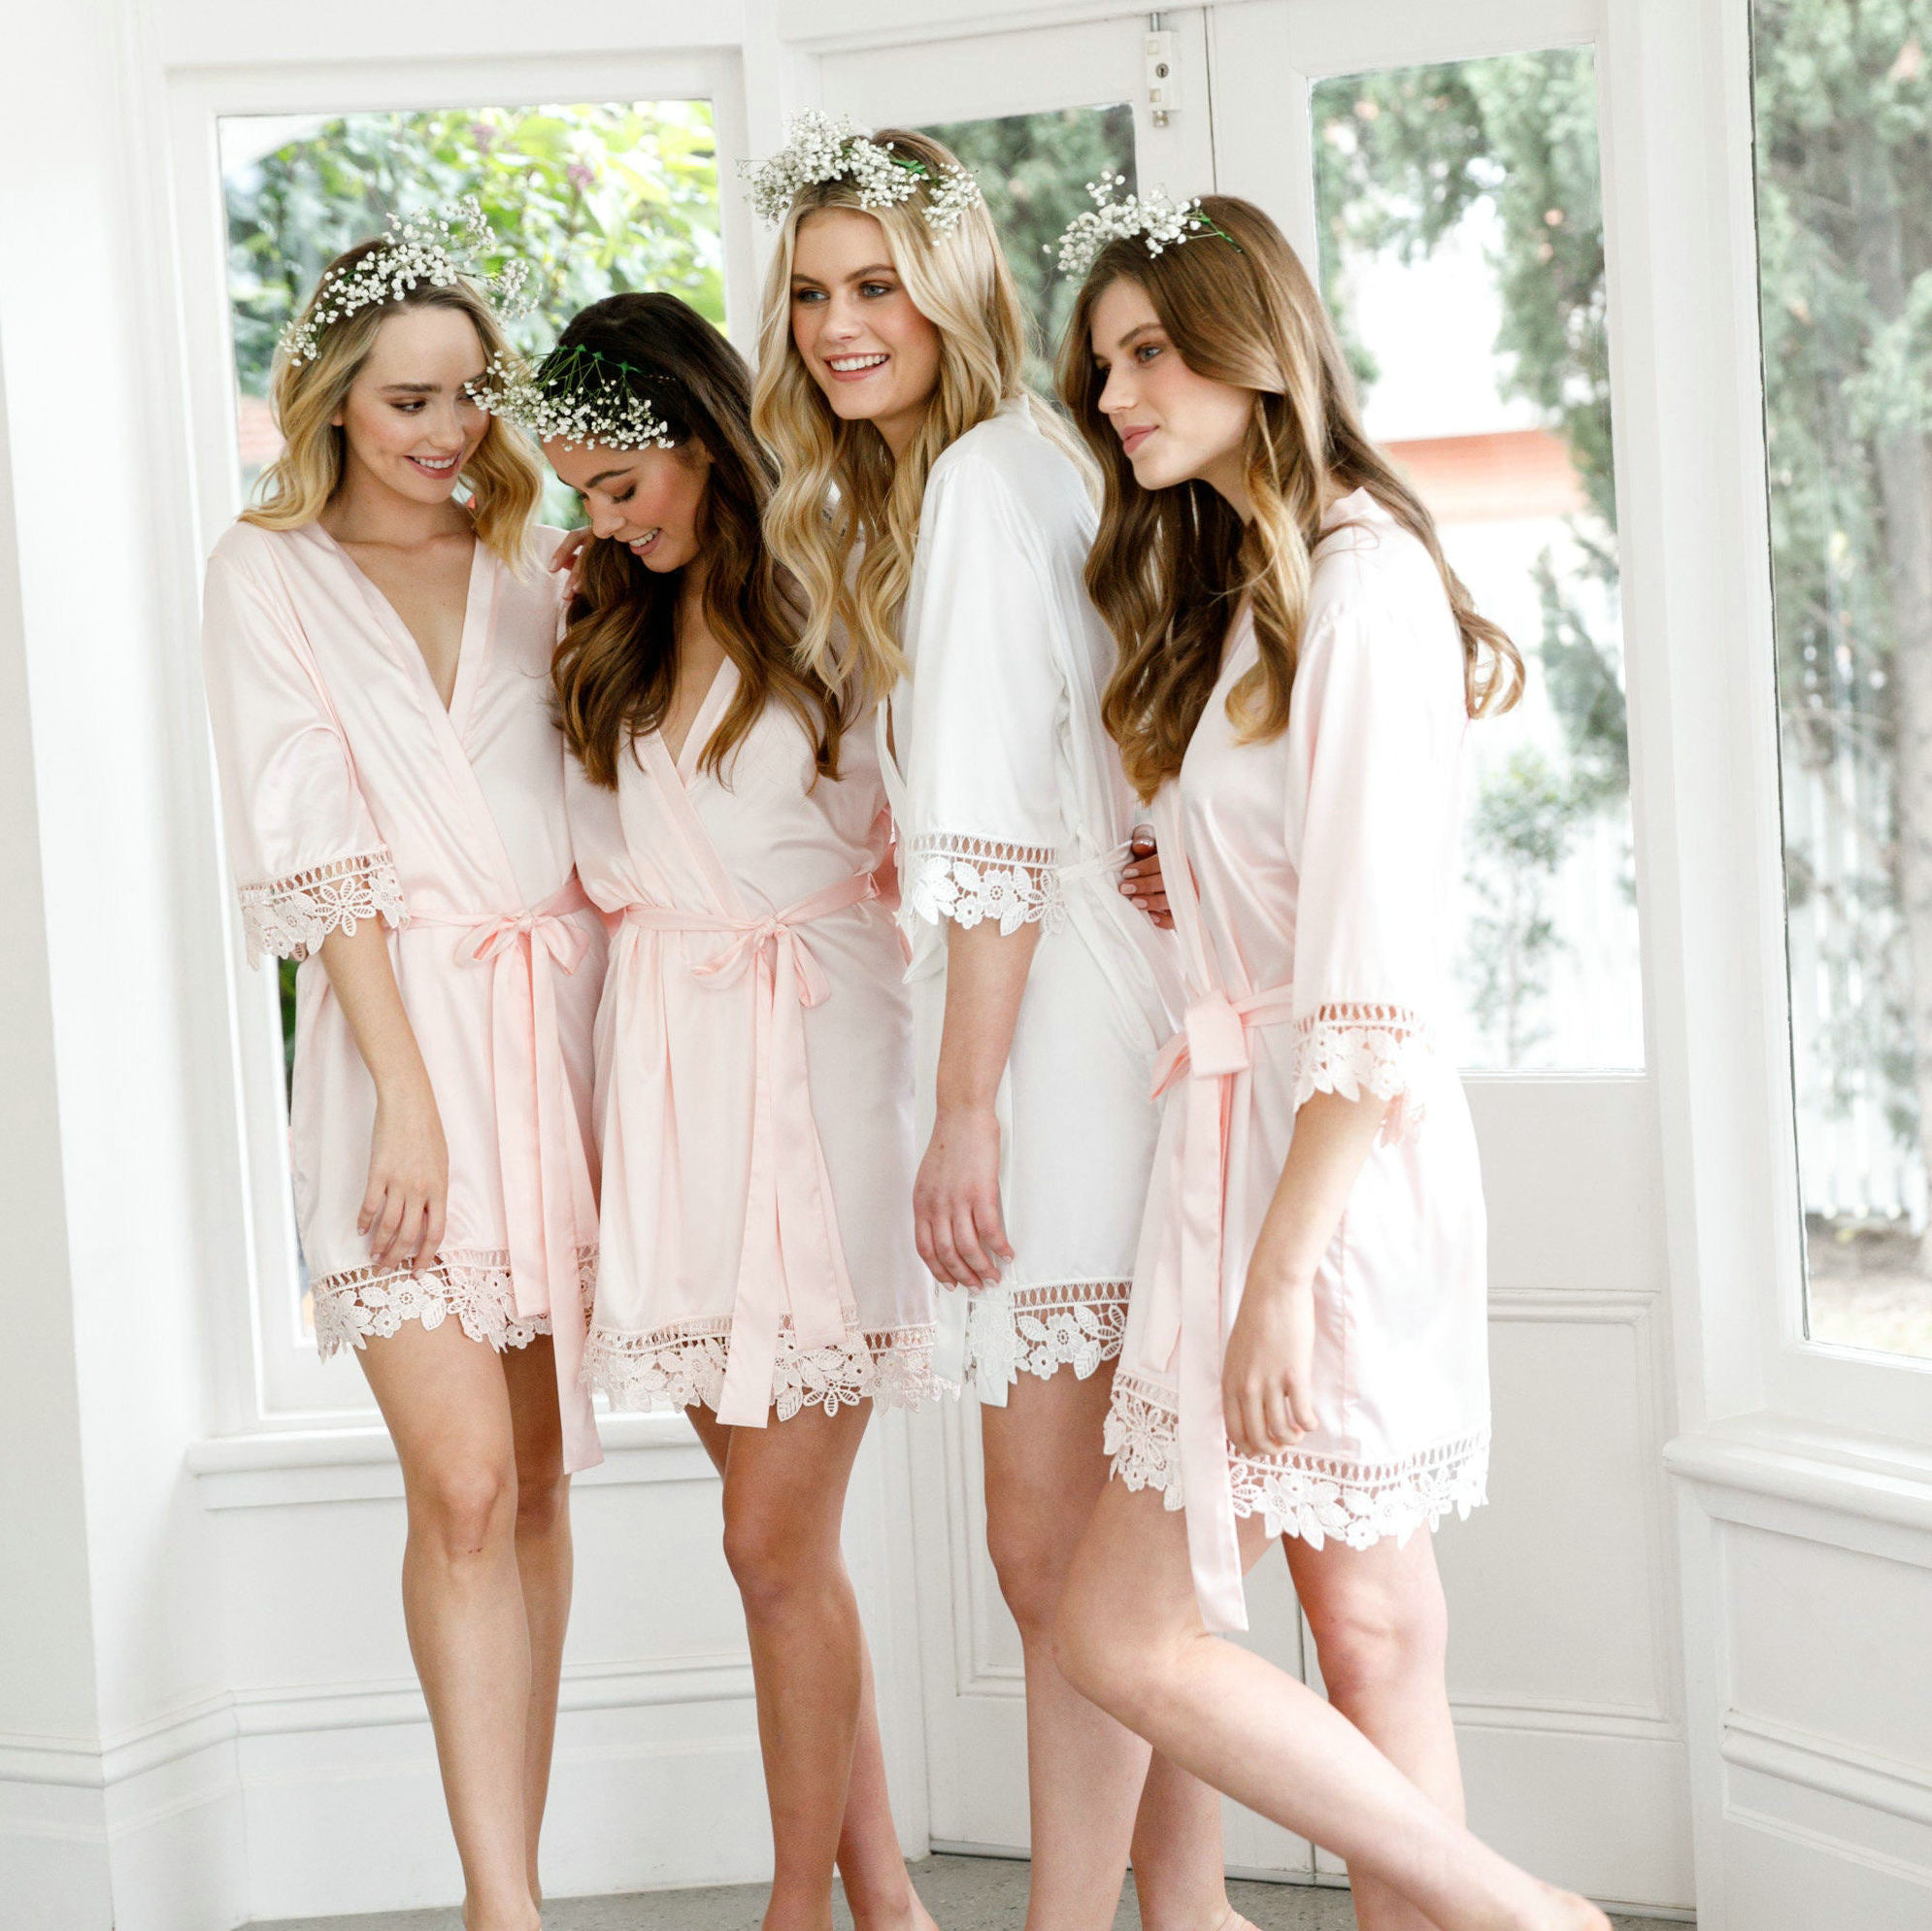 Silky Satin Lace Bath Robe Matt Satin Bridesmaid Bride with Lace Robe Bridal Robes Wedding Party Gifts Bathrobe Women Dress New